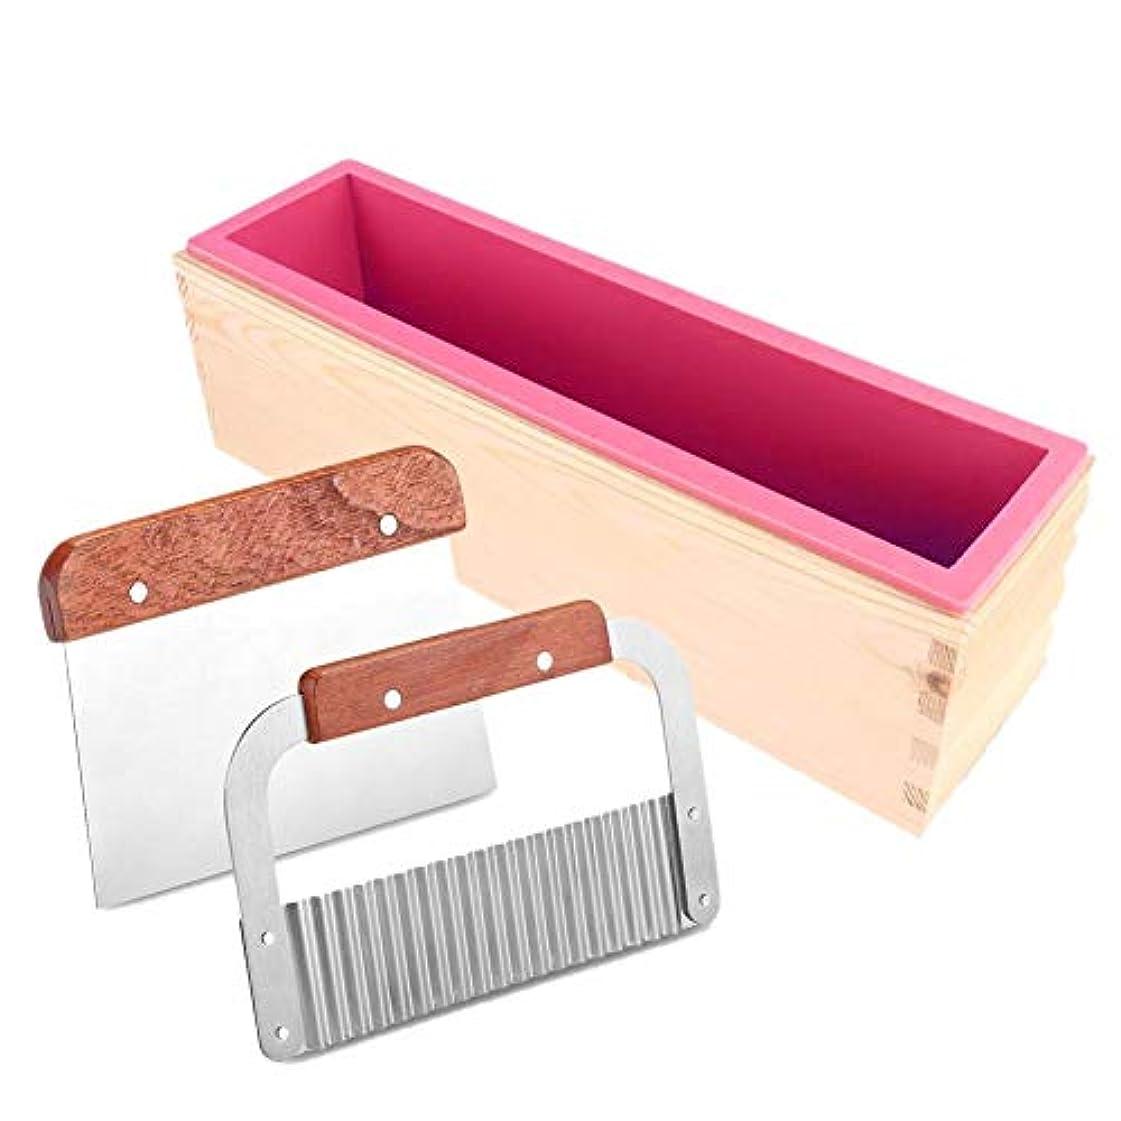 Ragemのシリコーンの石鹸型 - 自家製の石鹸の作成のための2Pcsカッターの皮むき器が付いている長方形の木箱の石鹸の作成型